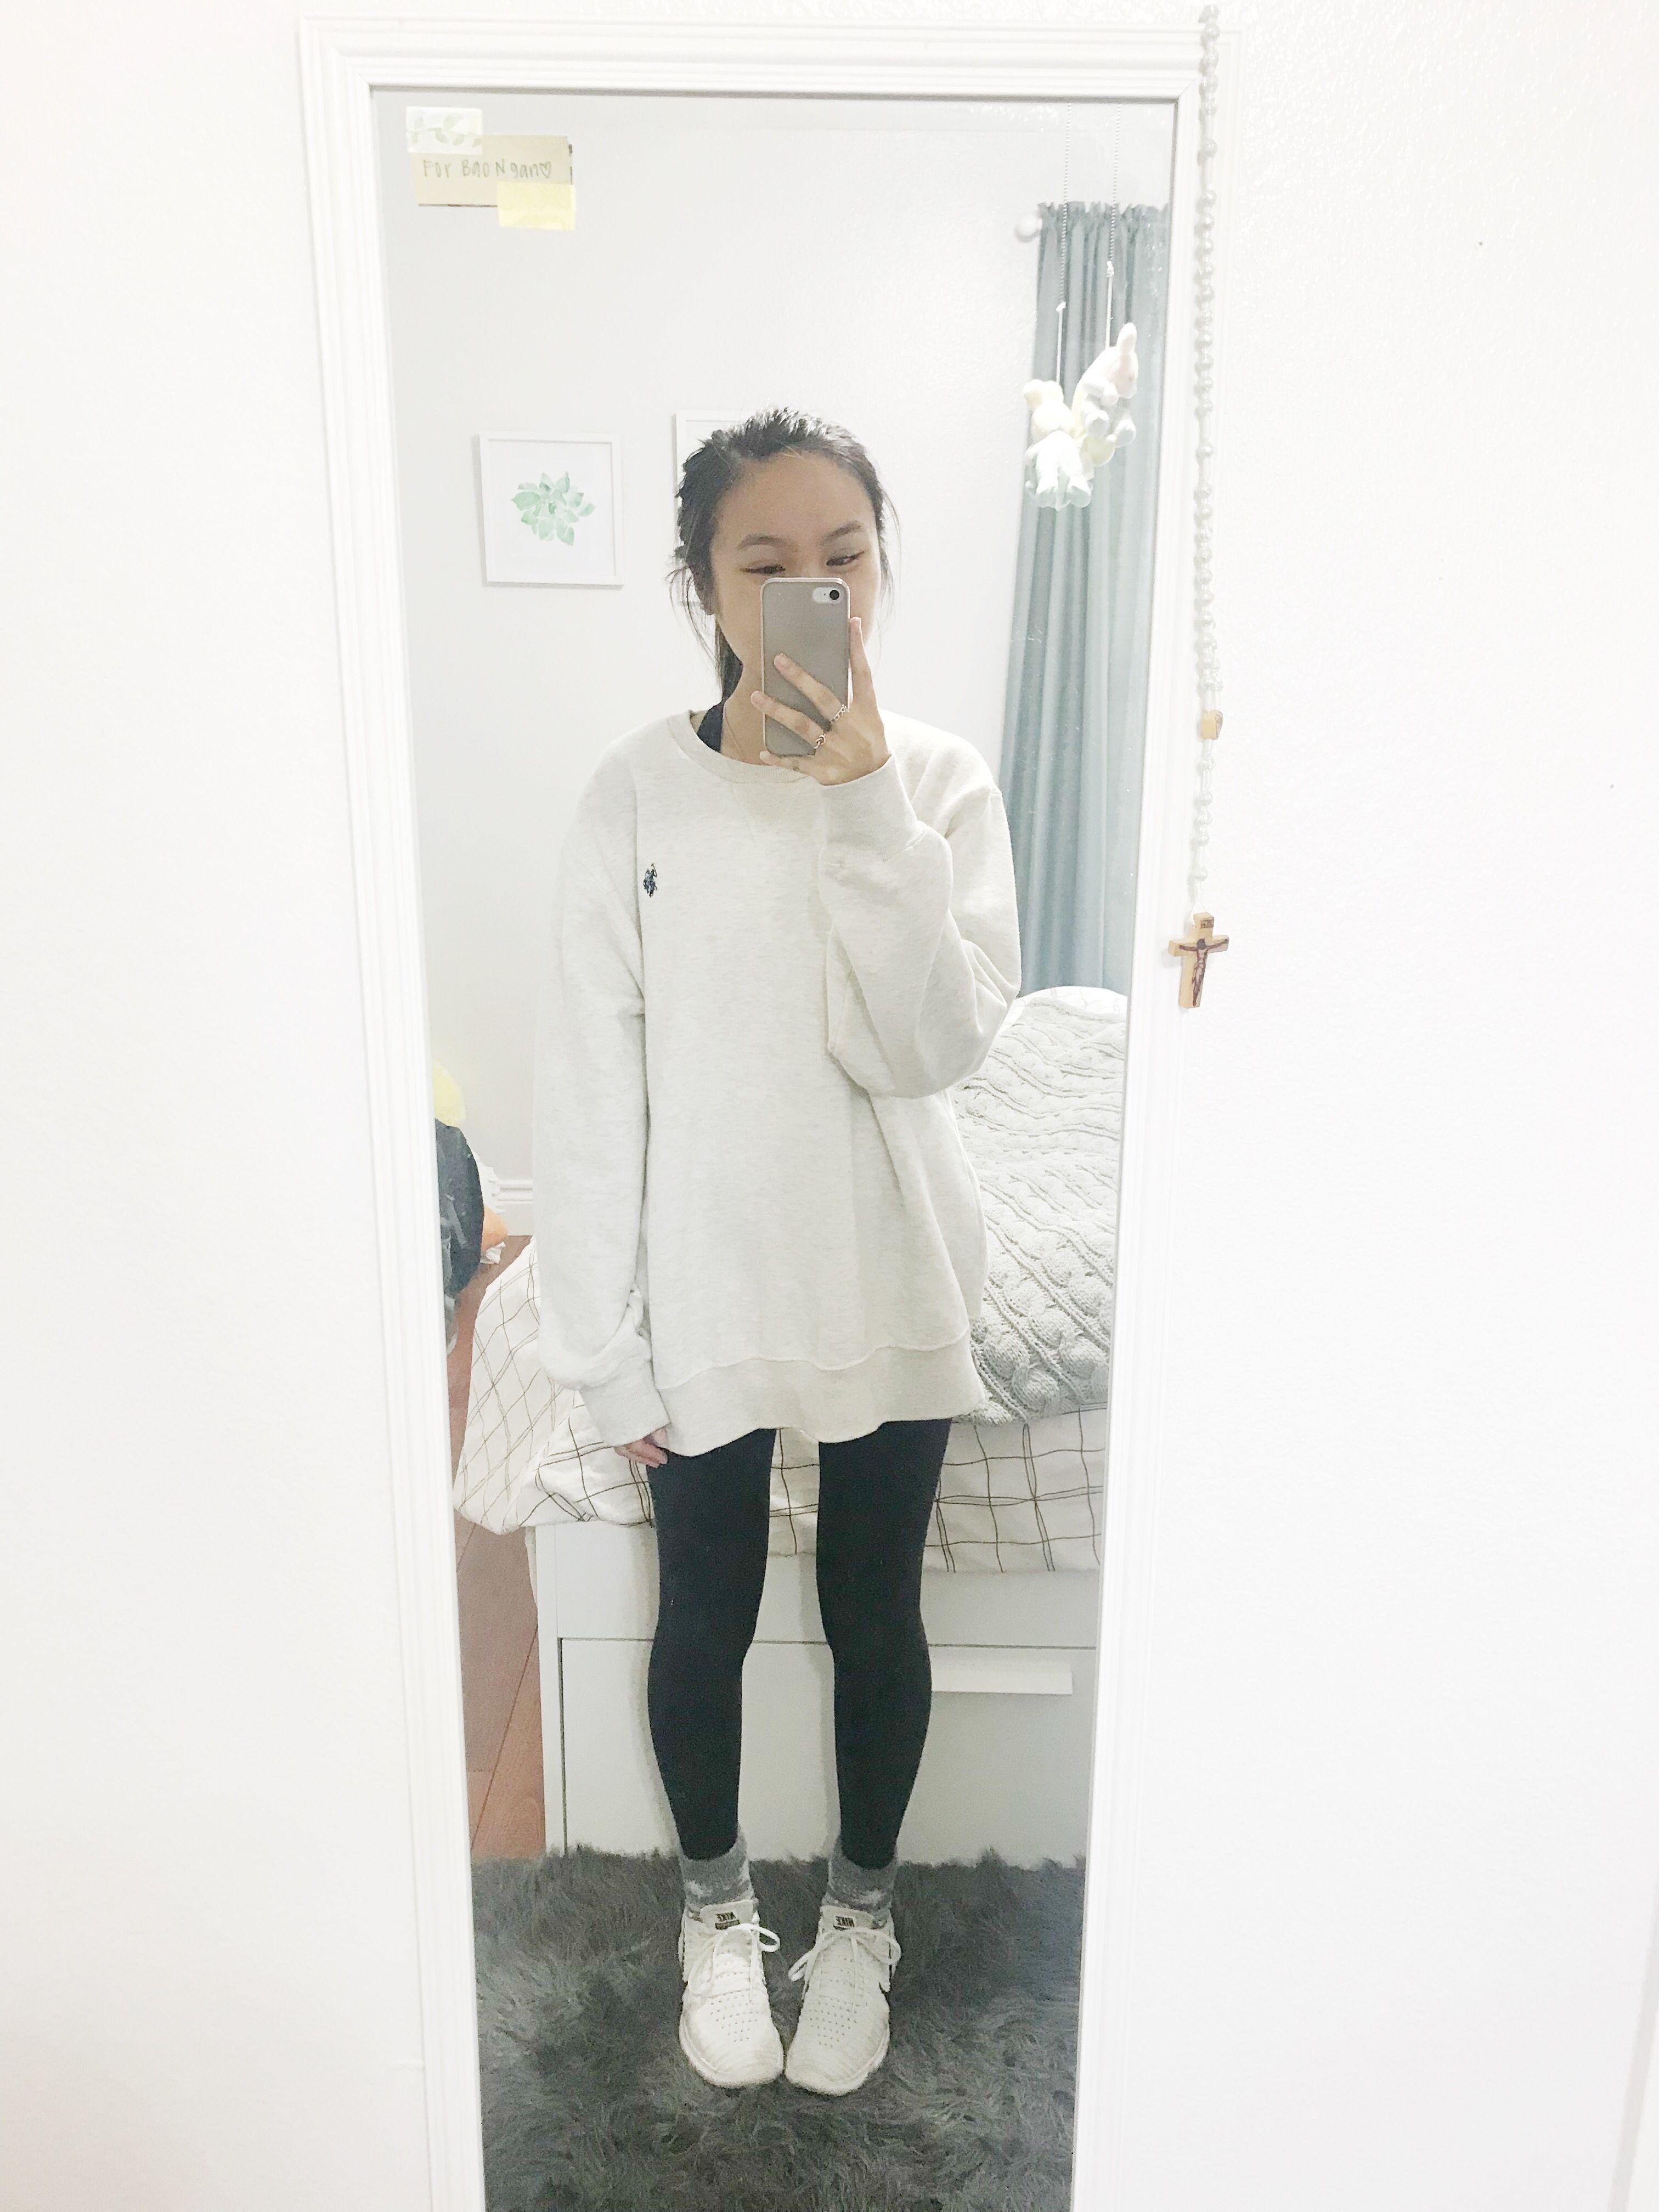 cream sweatshirt, leggings, fuzzy socks, white nikes